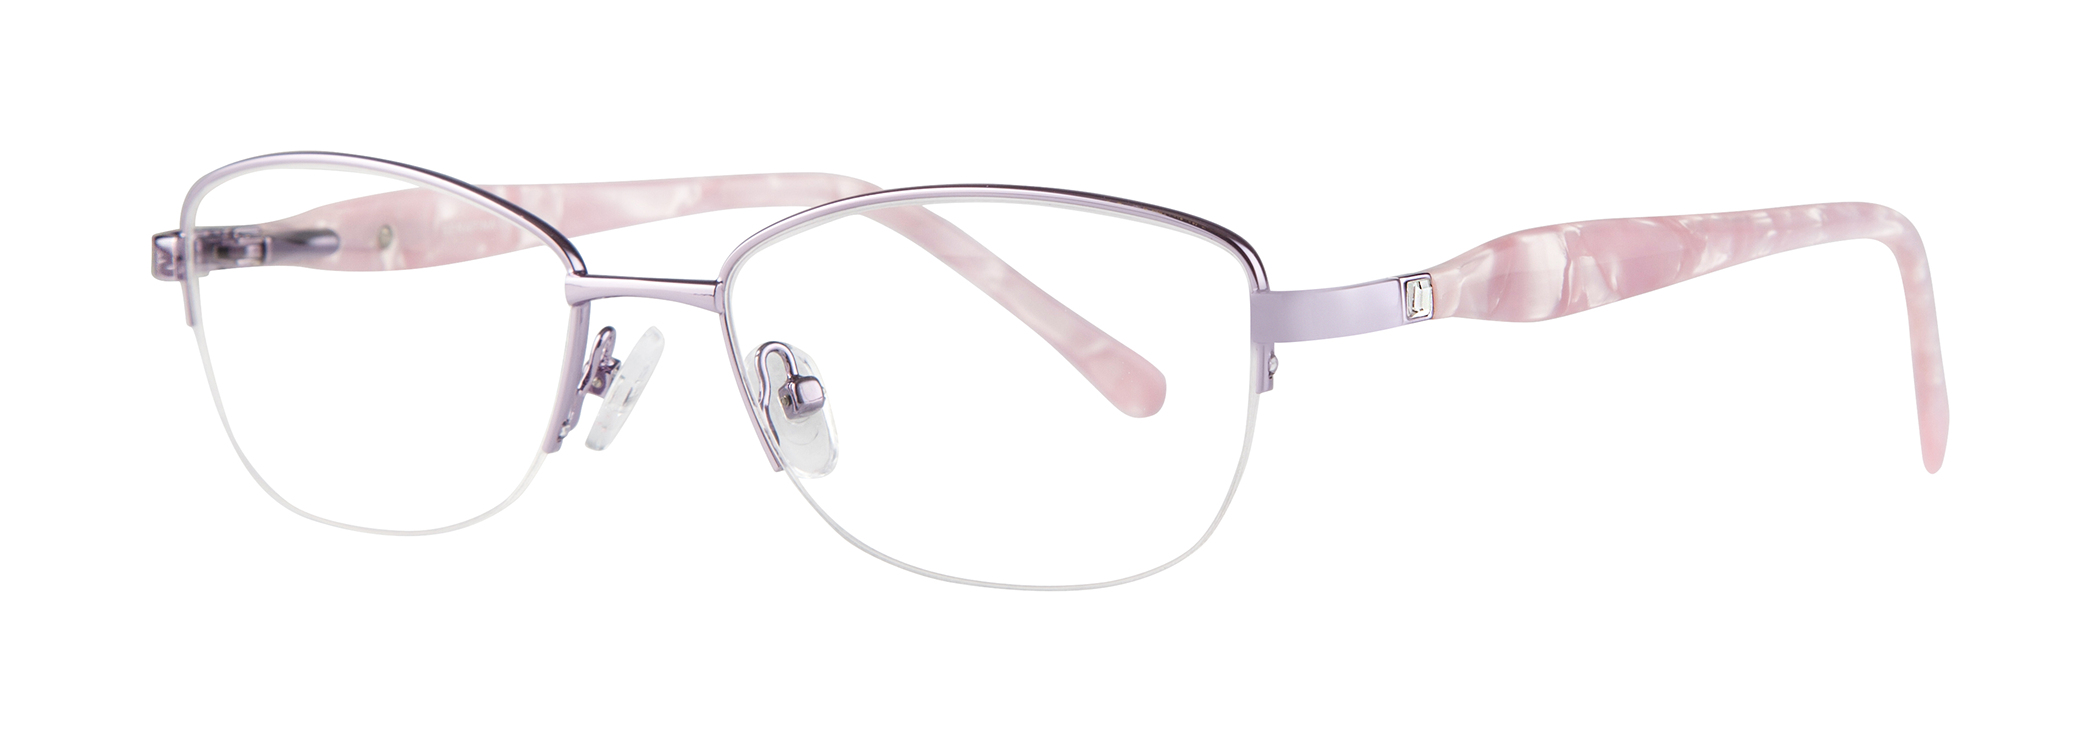 Picture of Serafina Eyewear Flora